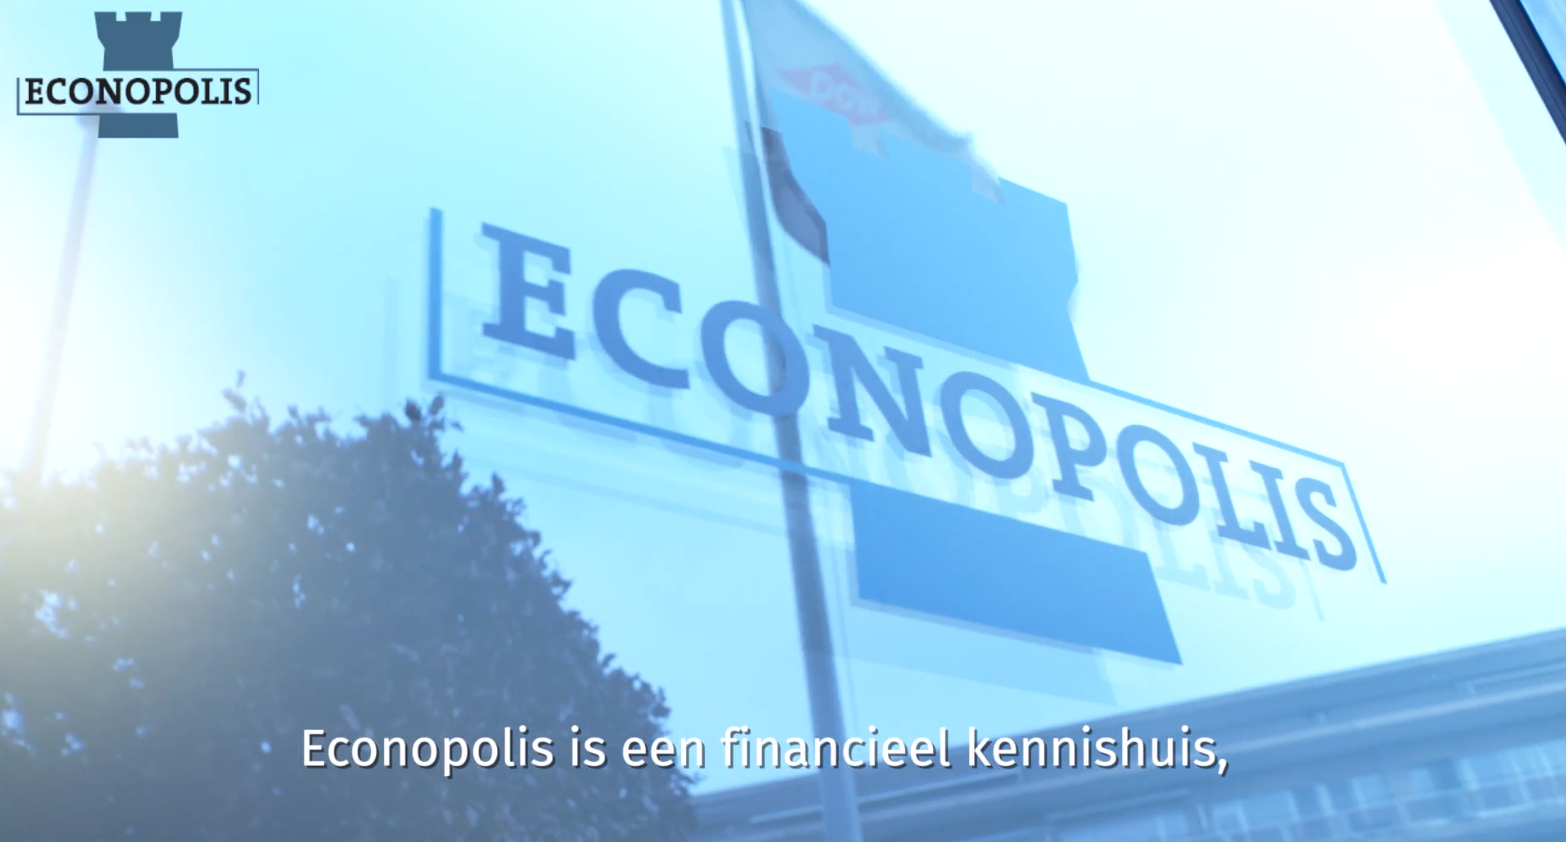 Logo of Econopolis